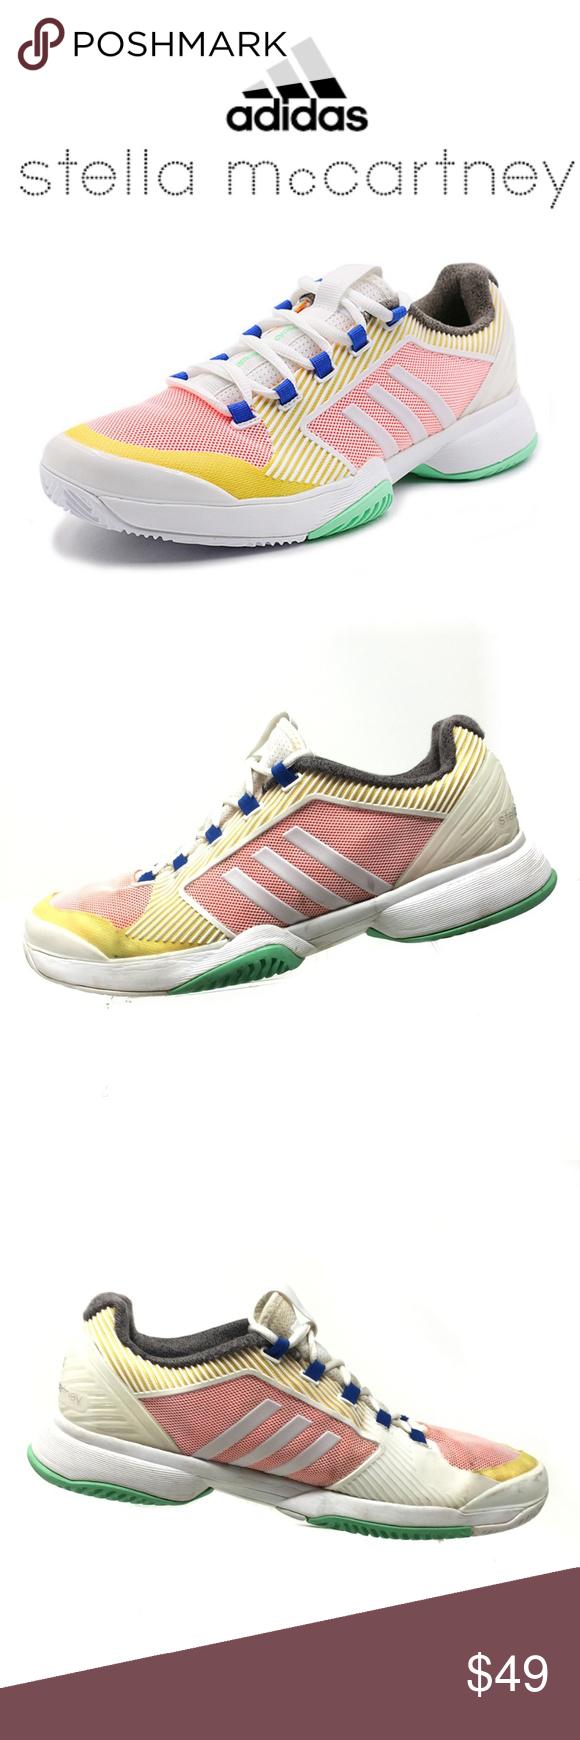 1c7648c7c2d7 Adidas Stella McCartney Barricade Shoes Womens 9.5 Adidas x Stella  McCartney Barricade Upcycled Tennis Shoes Women s